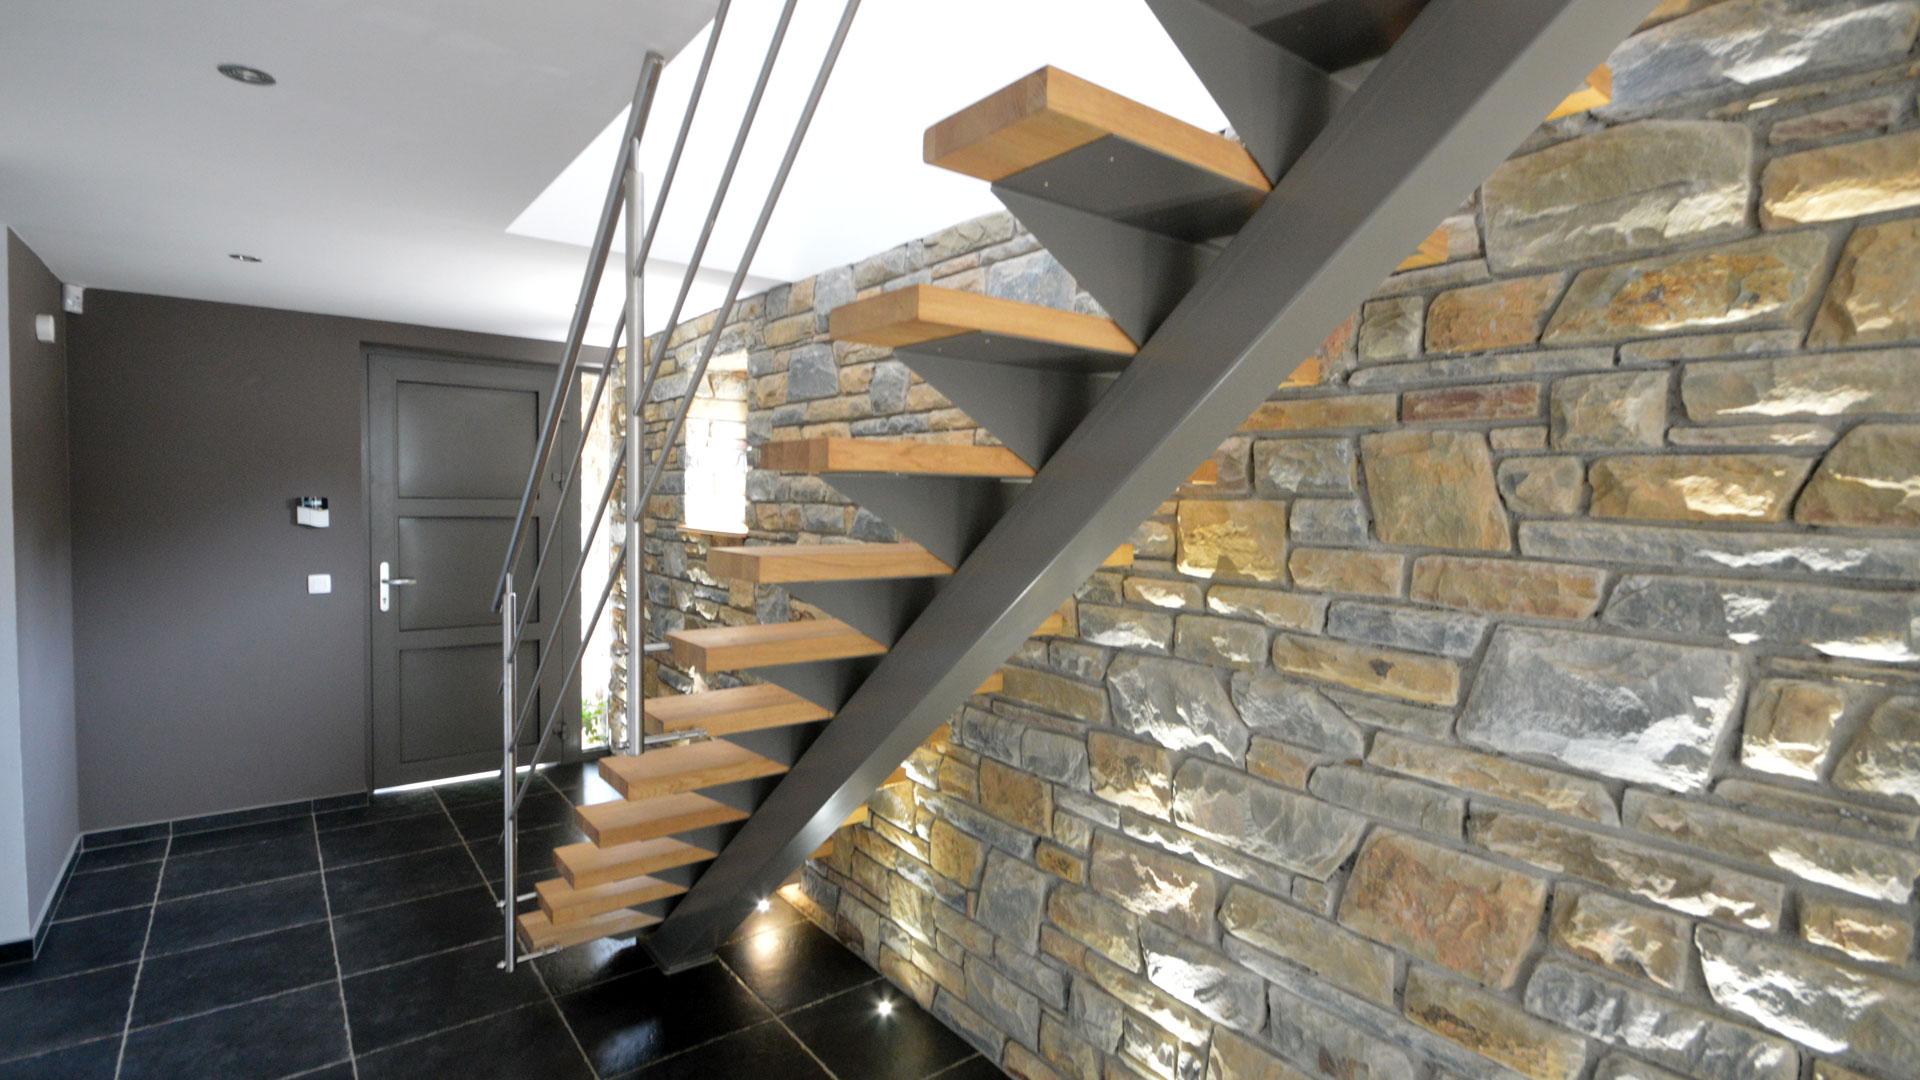 trageco l architecture en moellons. Black Bedroom Furniture Sets. Home Design Ideas